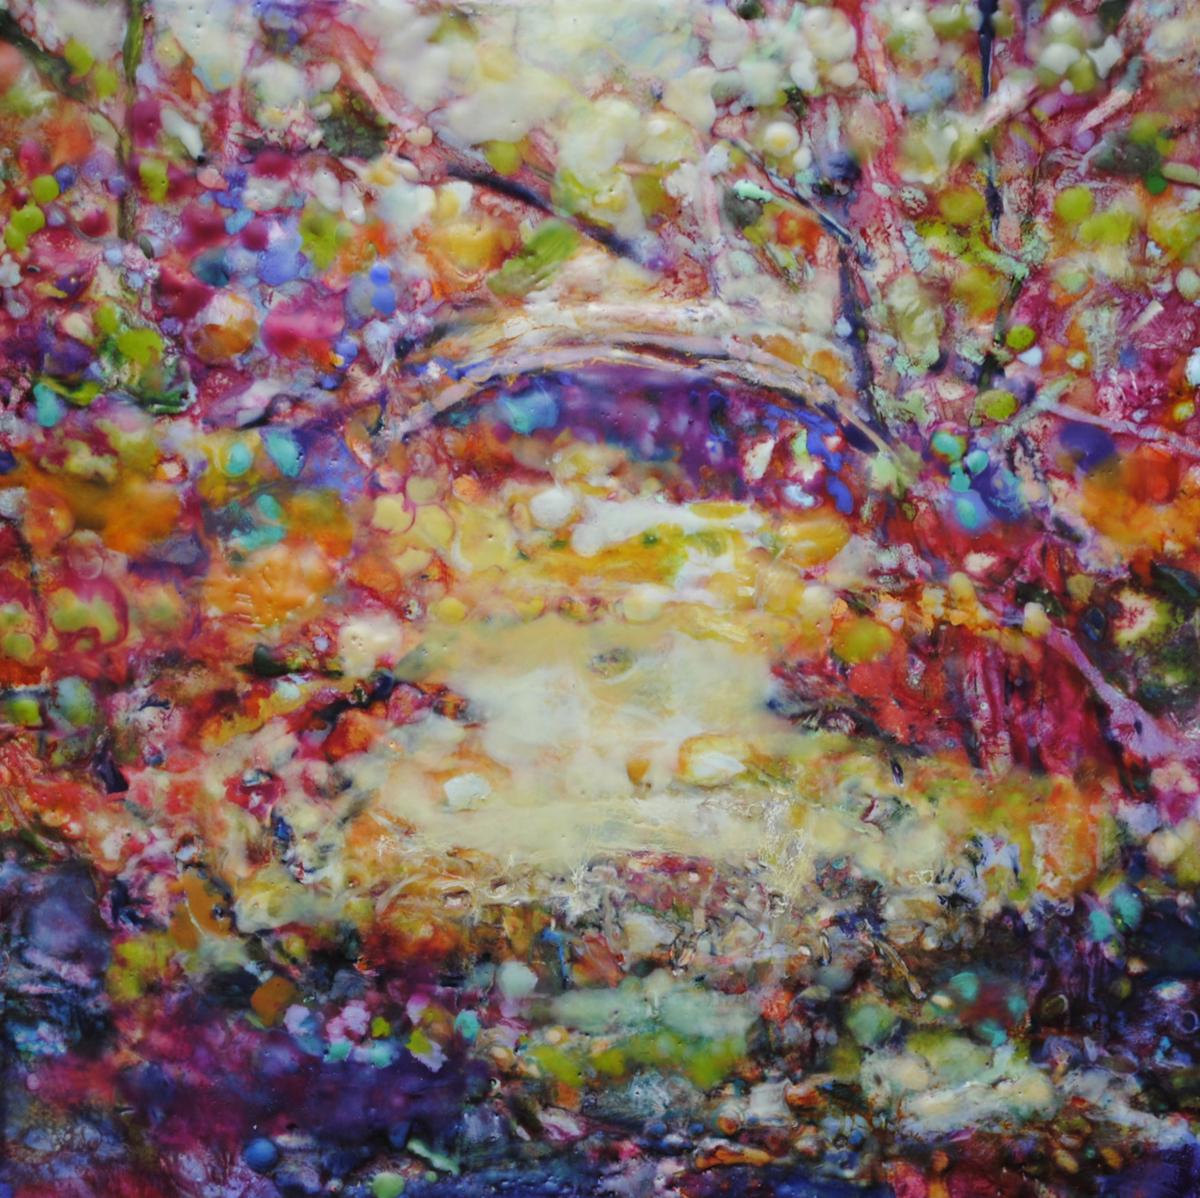 Floral Bridge (revised) (large view)